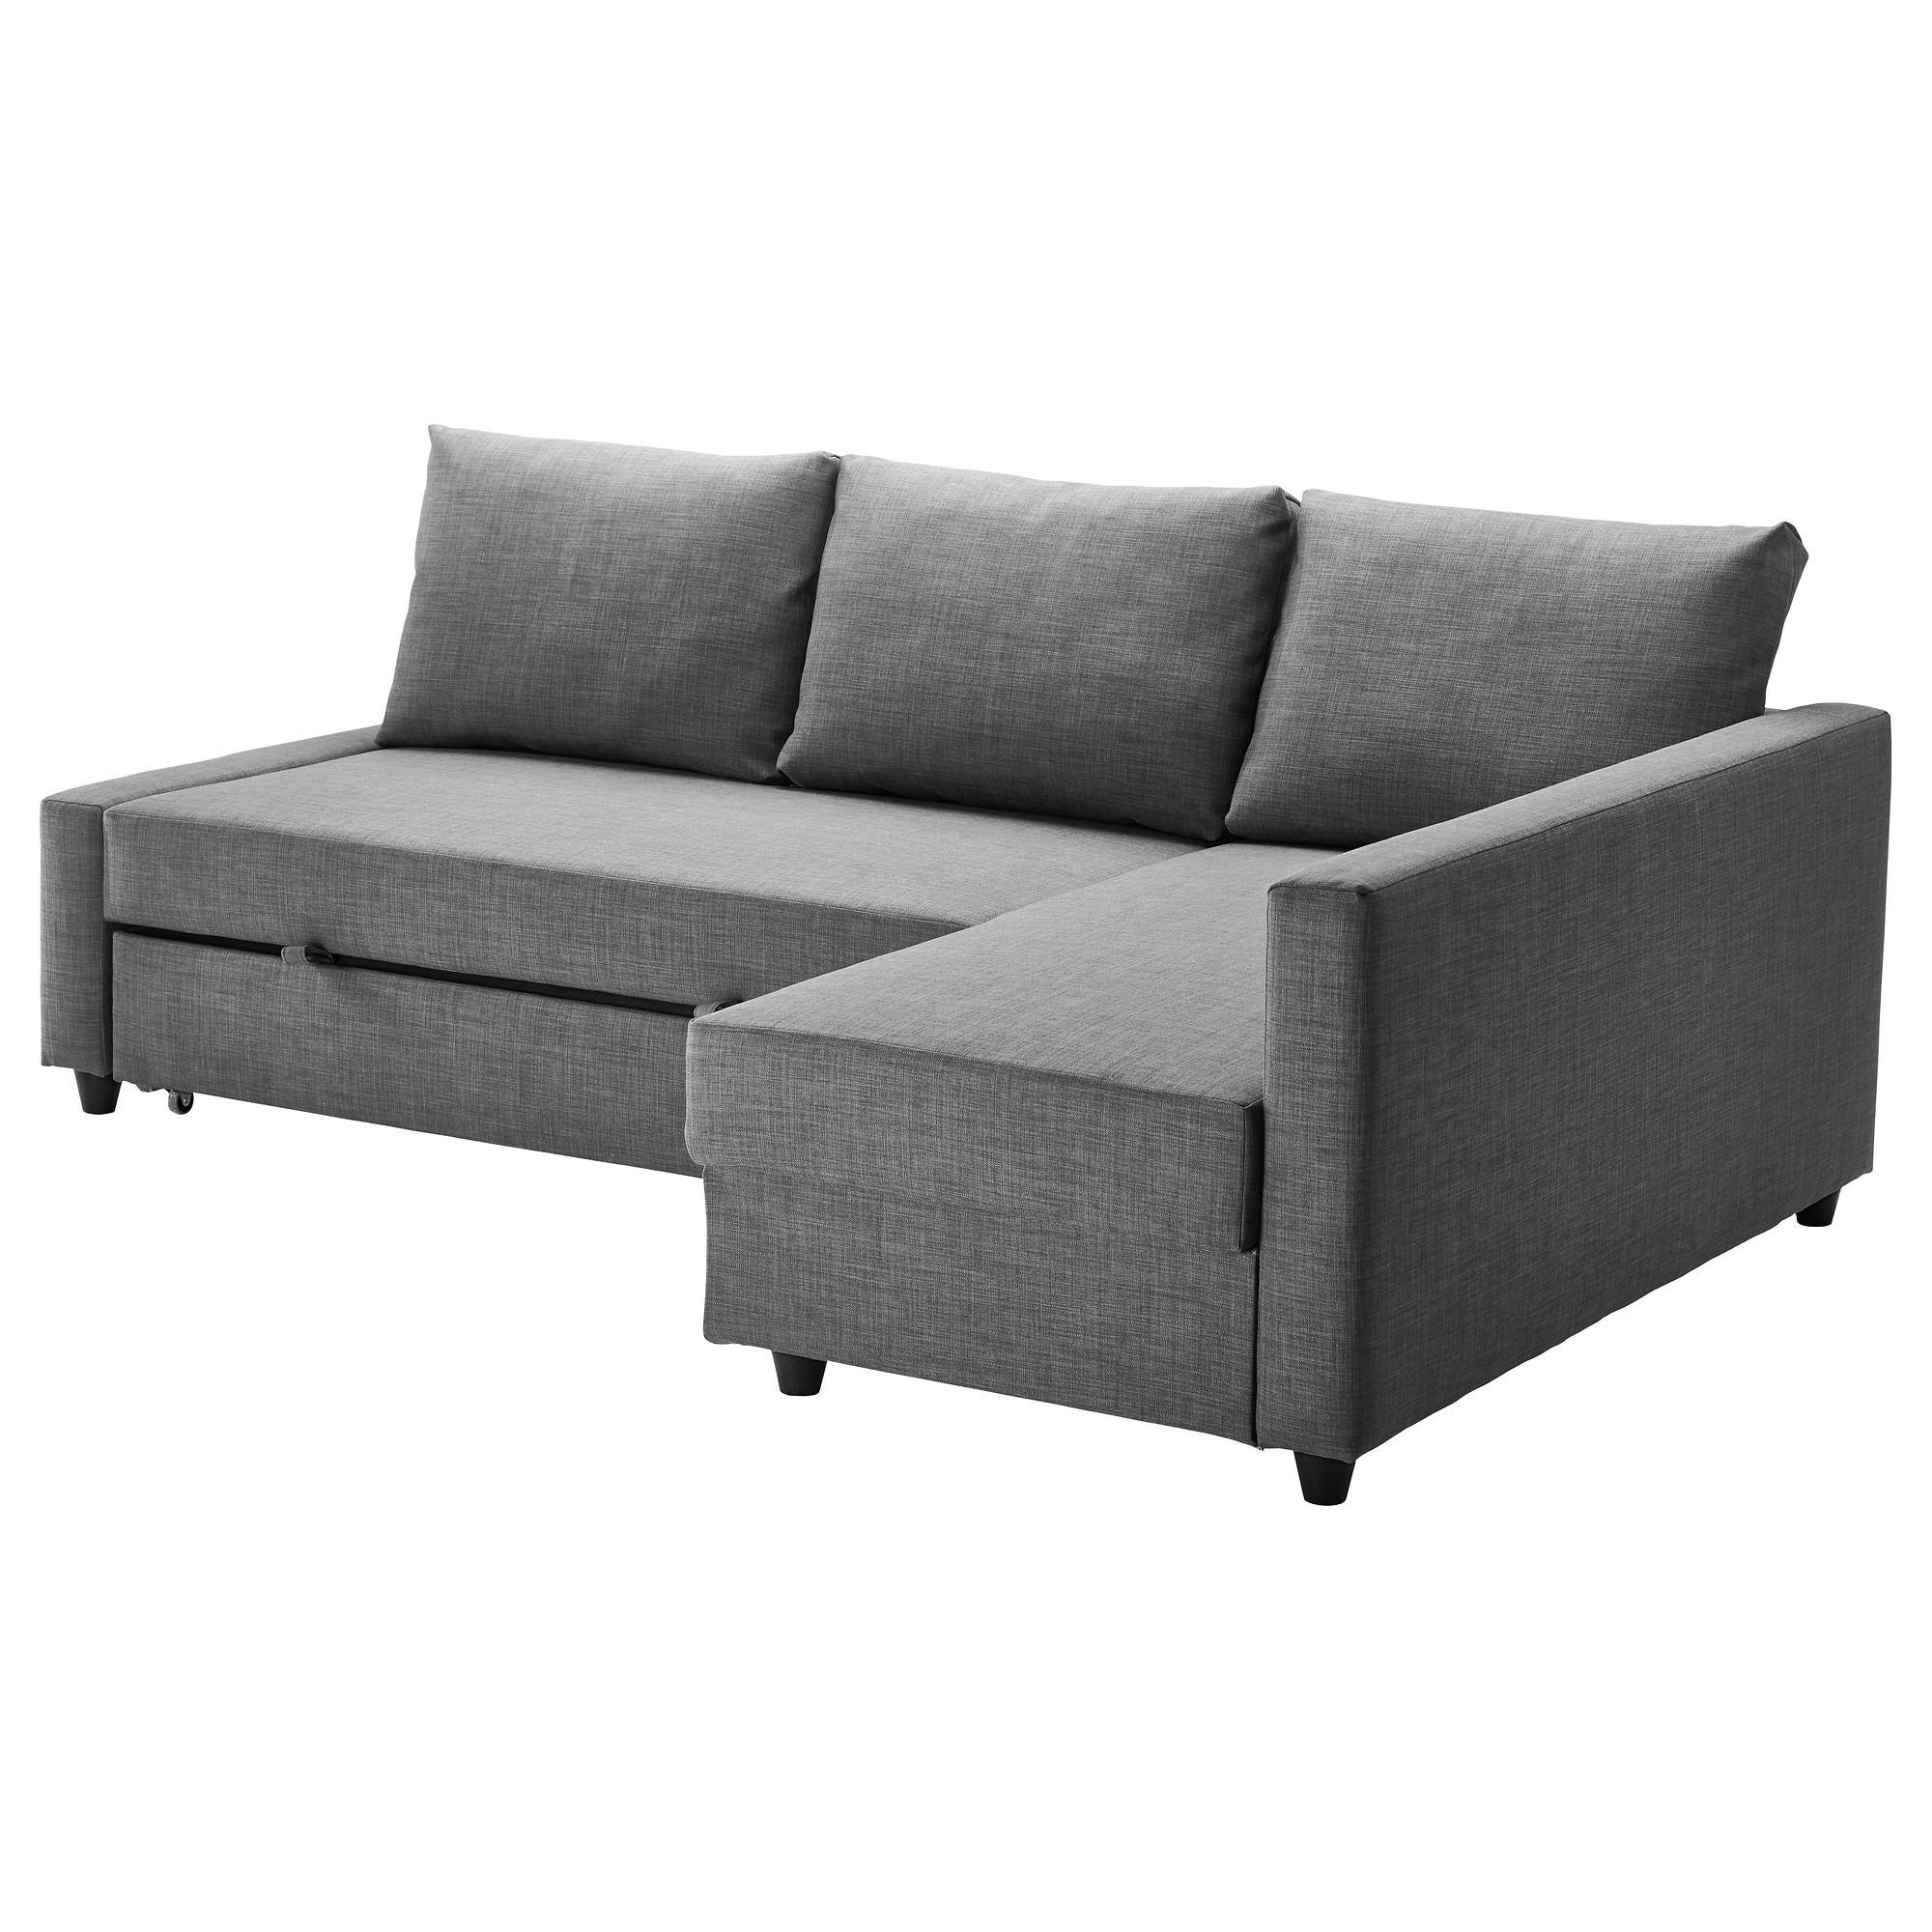 Friheten Corner Sofa Bed With Storage Skiftebo Dark Grey – Ikea Pertaining To Corner Sofa Beds (Image 10 of 20)